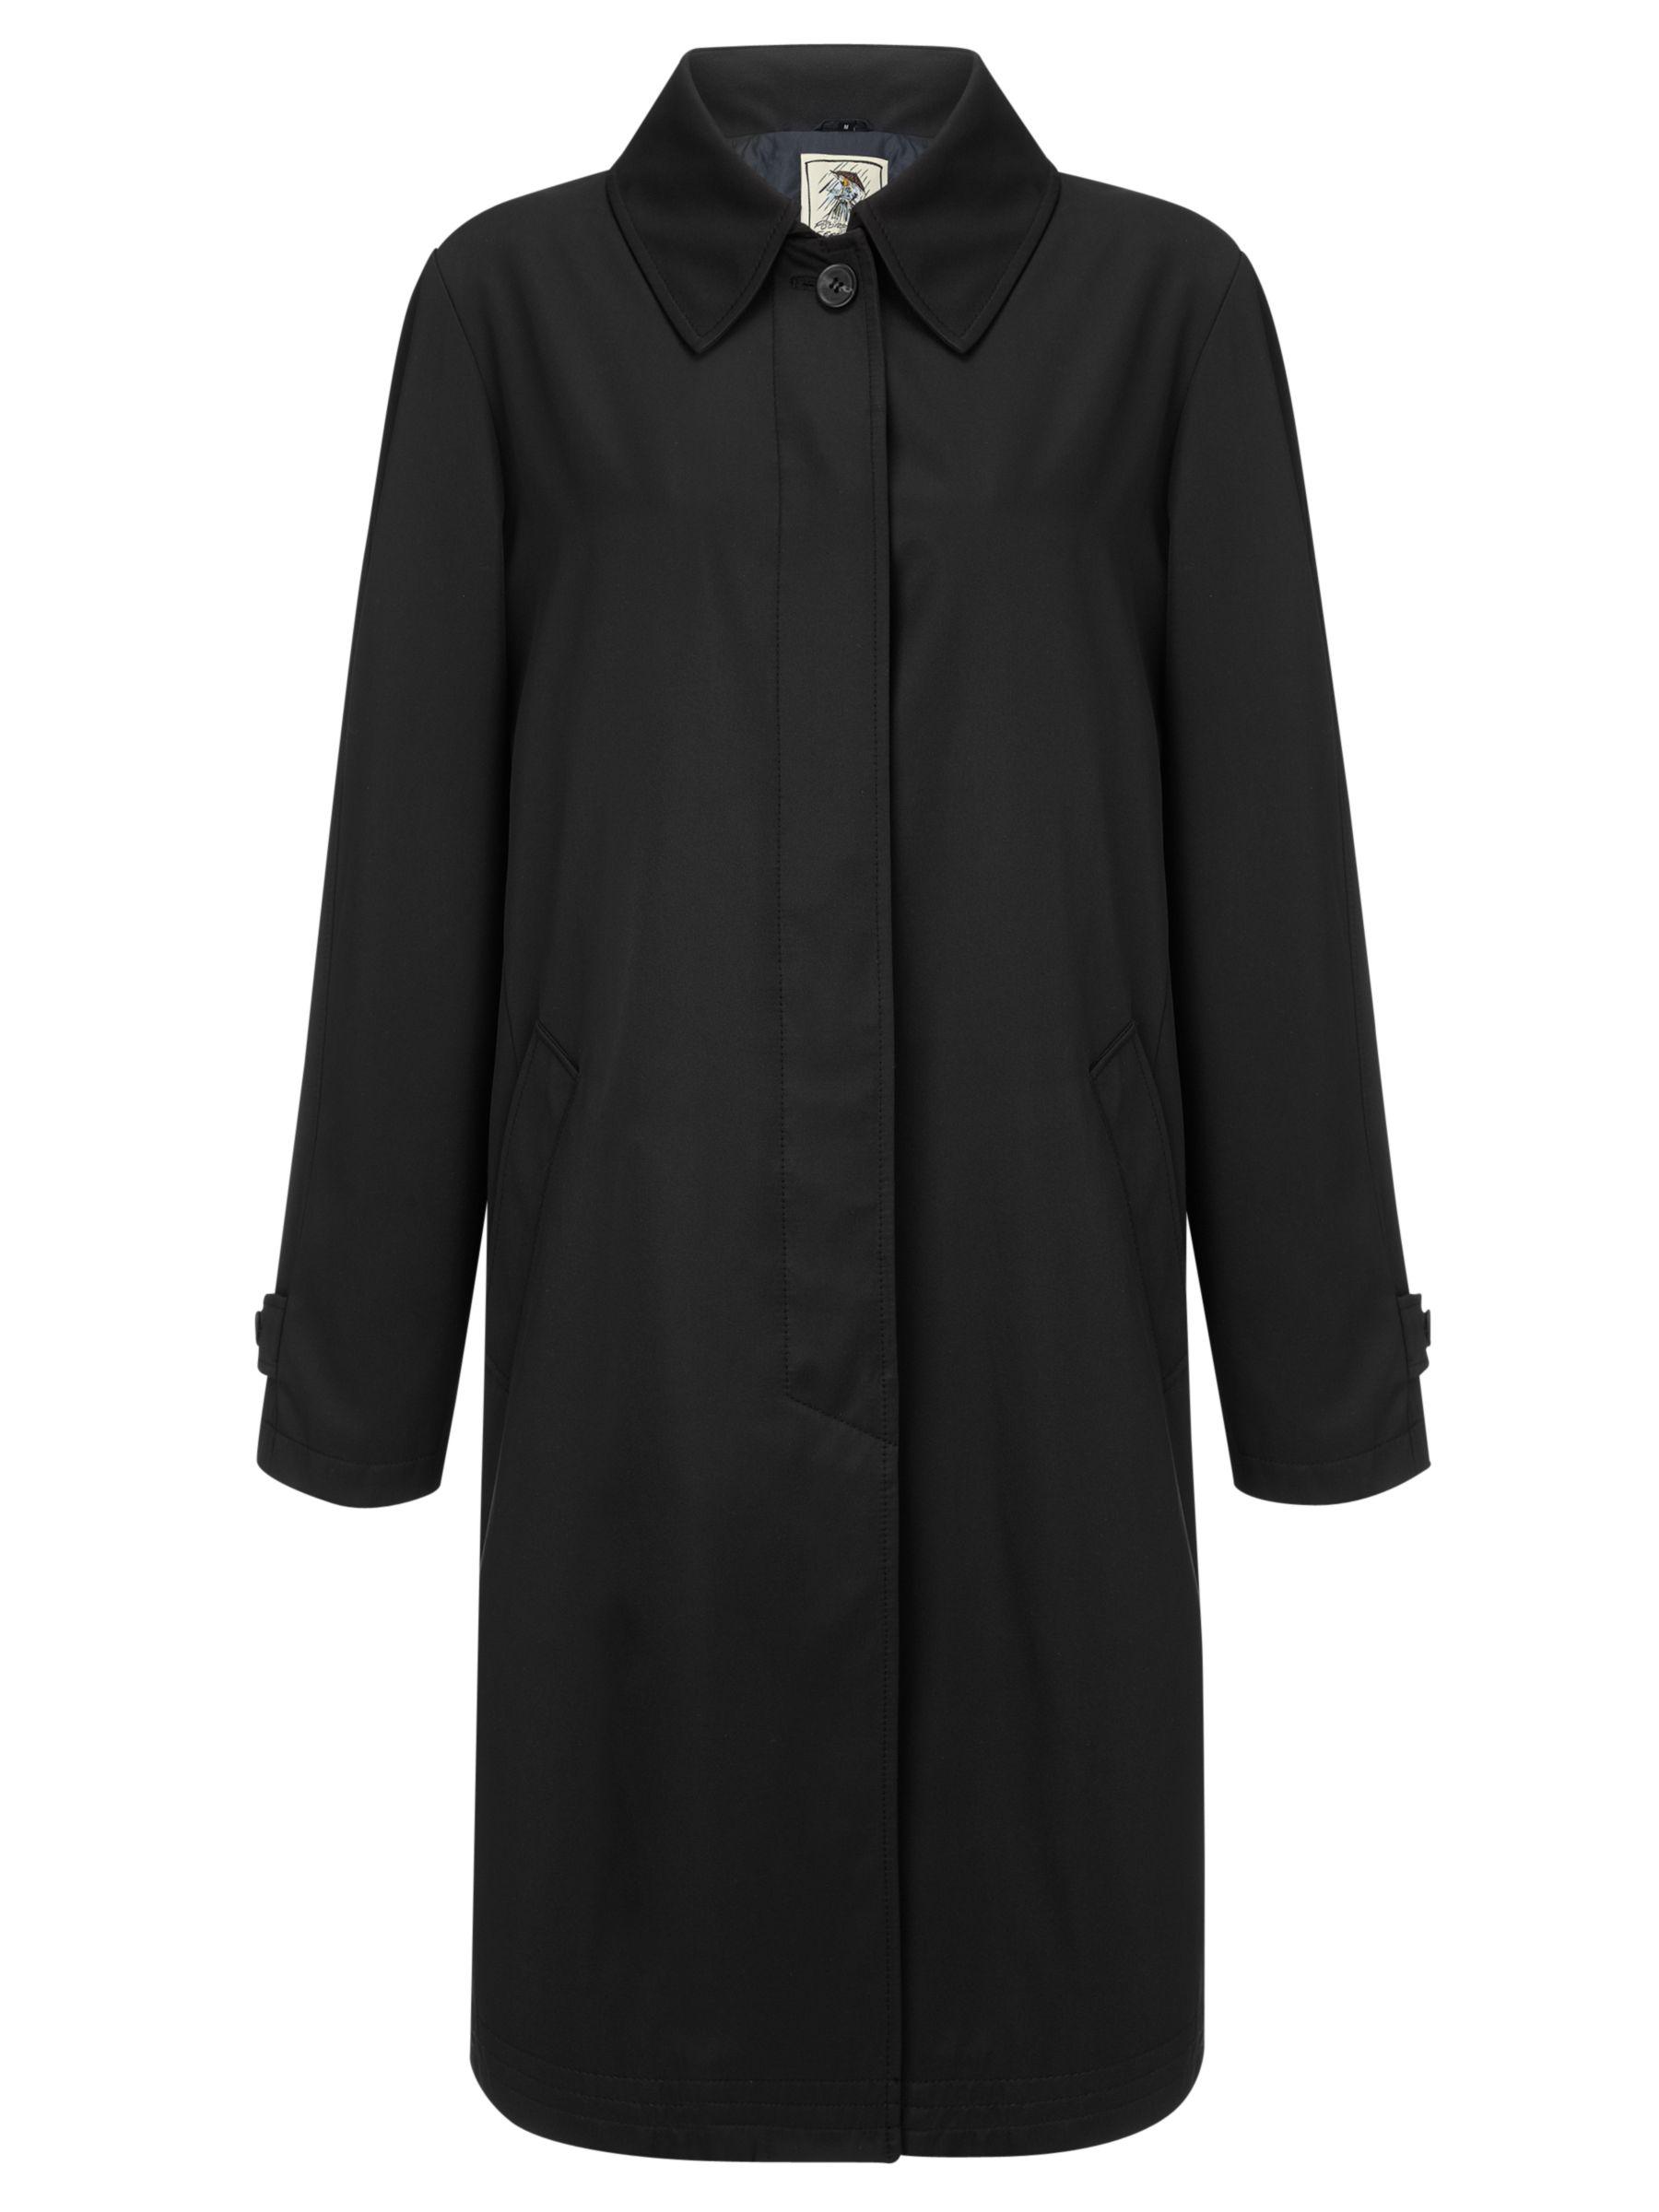 Four Seasons London Raincoat, Black